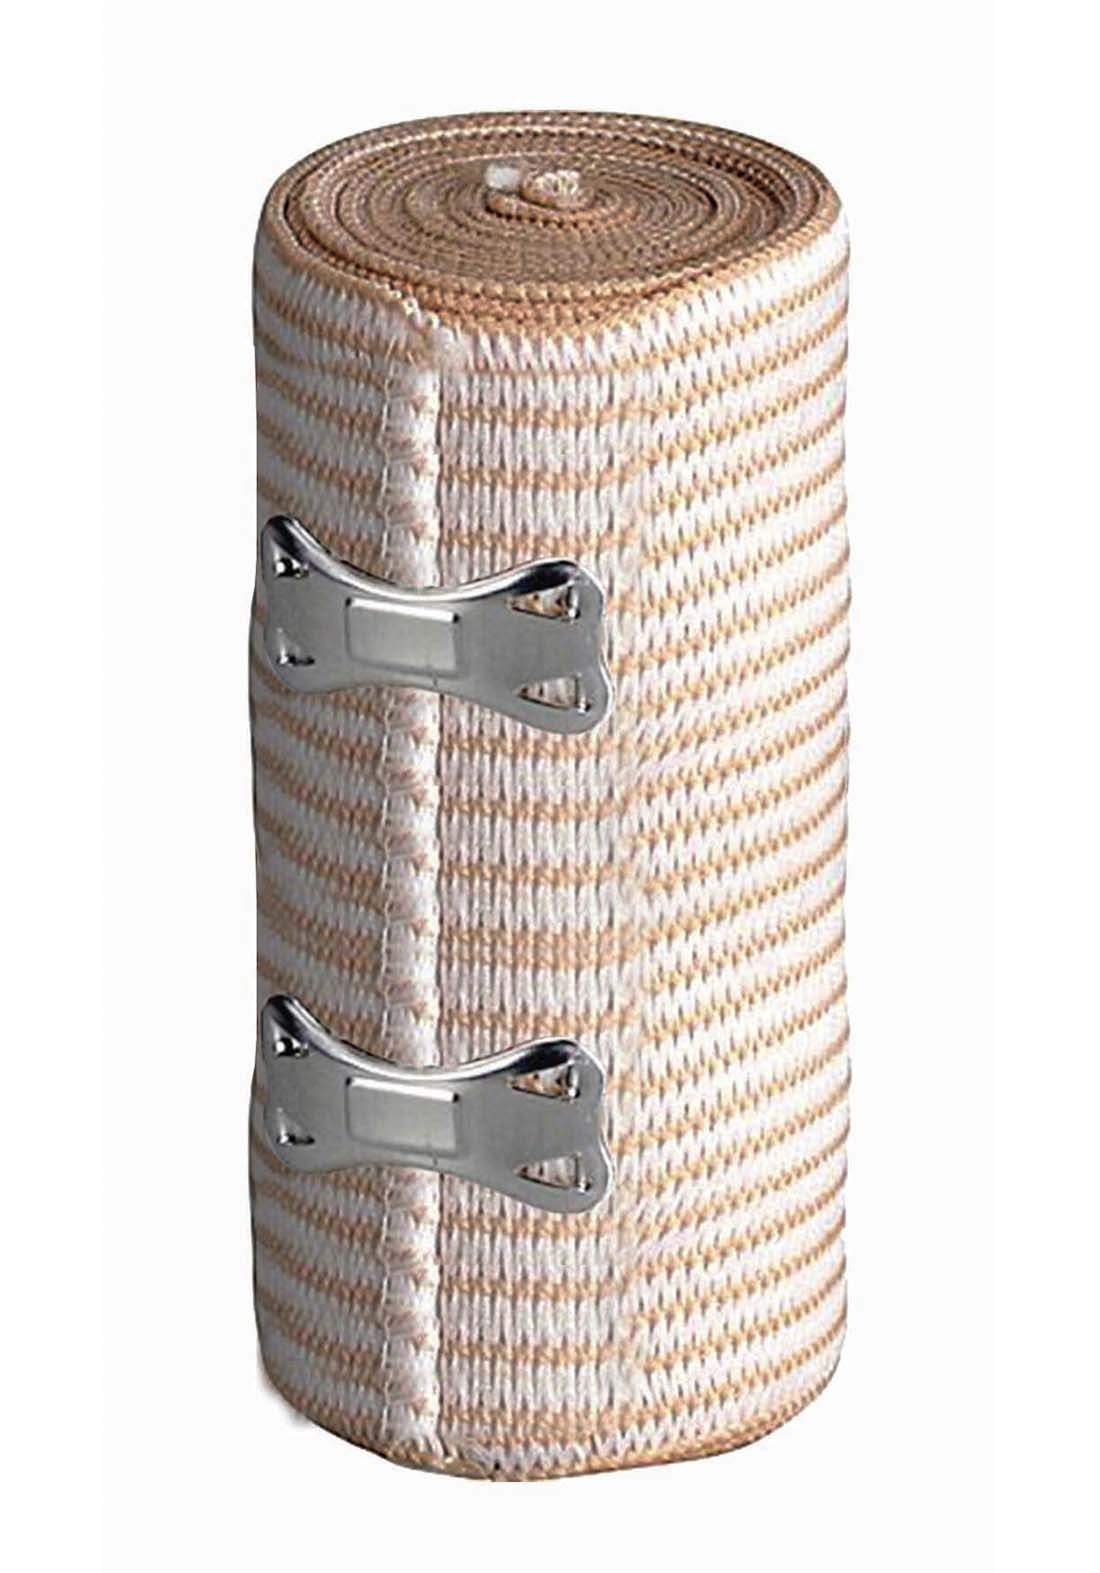 Optimal lastic Bandages With Metal Clips ضمادات طبية مطاطة بمشبك معدني